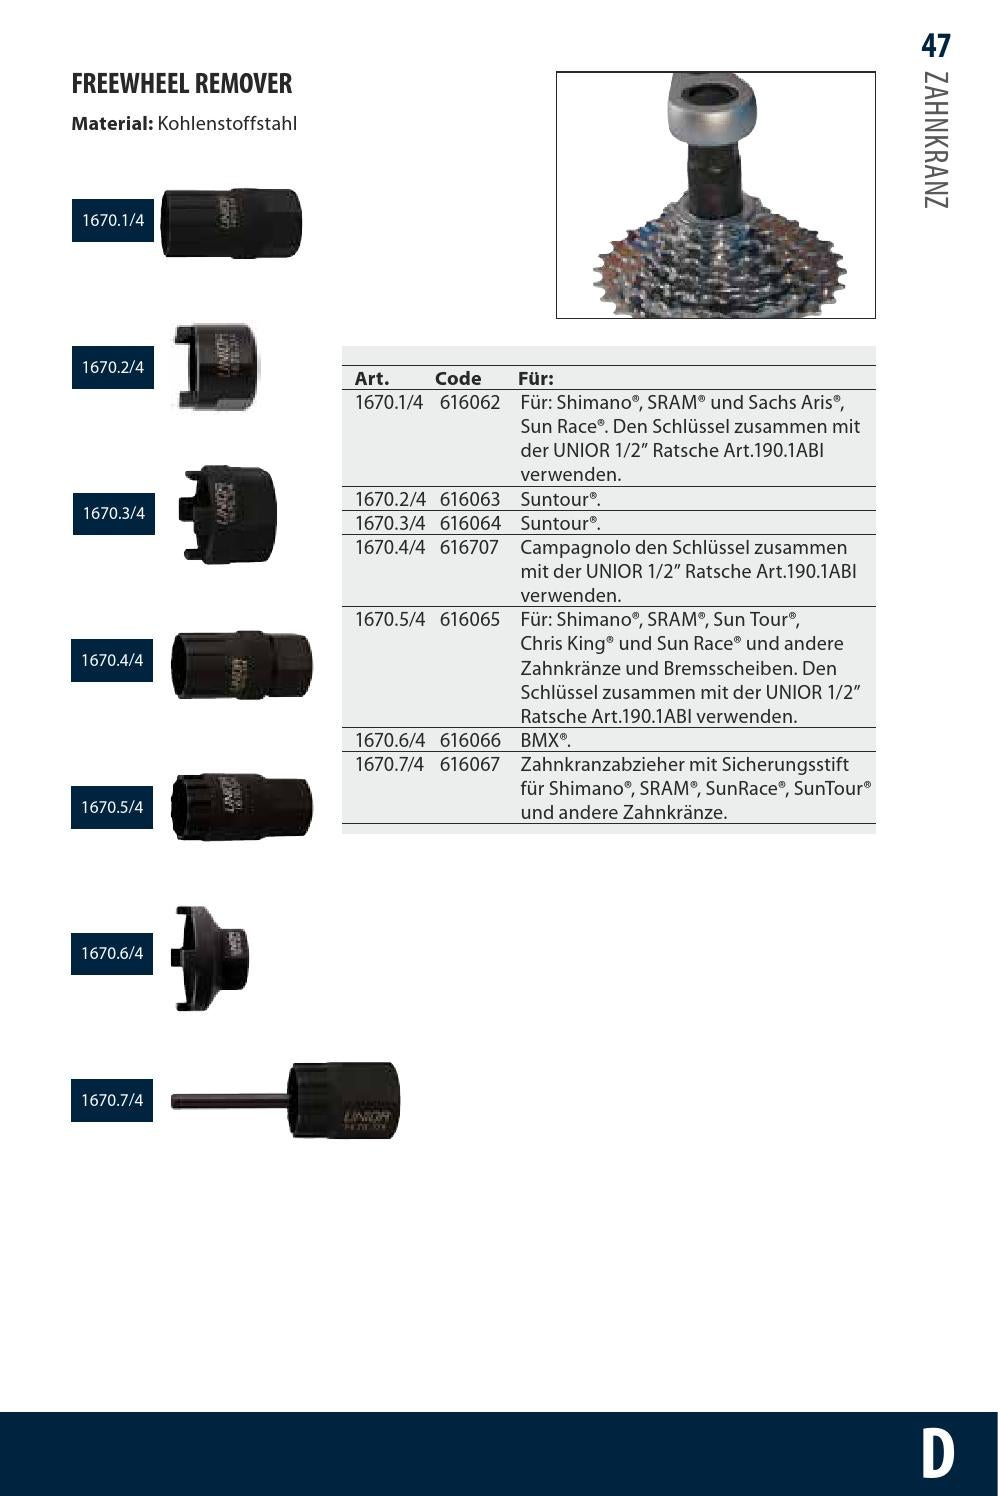 Spro Freestyle Skillz Dropshot Kit Slug 73mm 6 Köder Gewichte 10g 7g System Rig